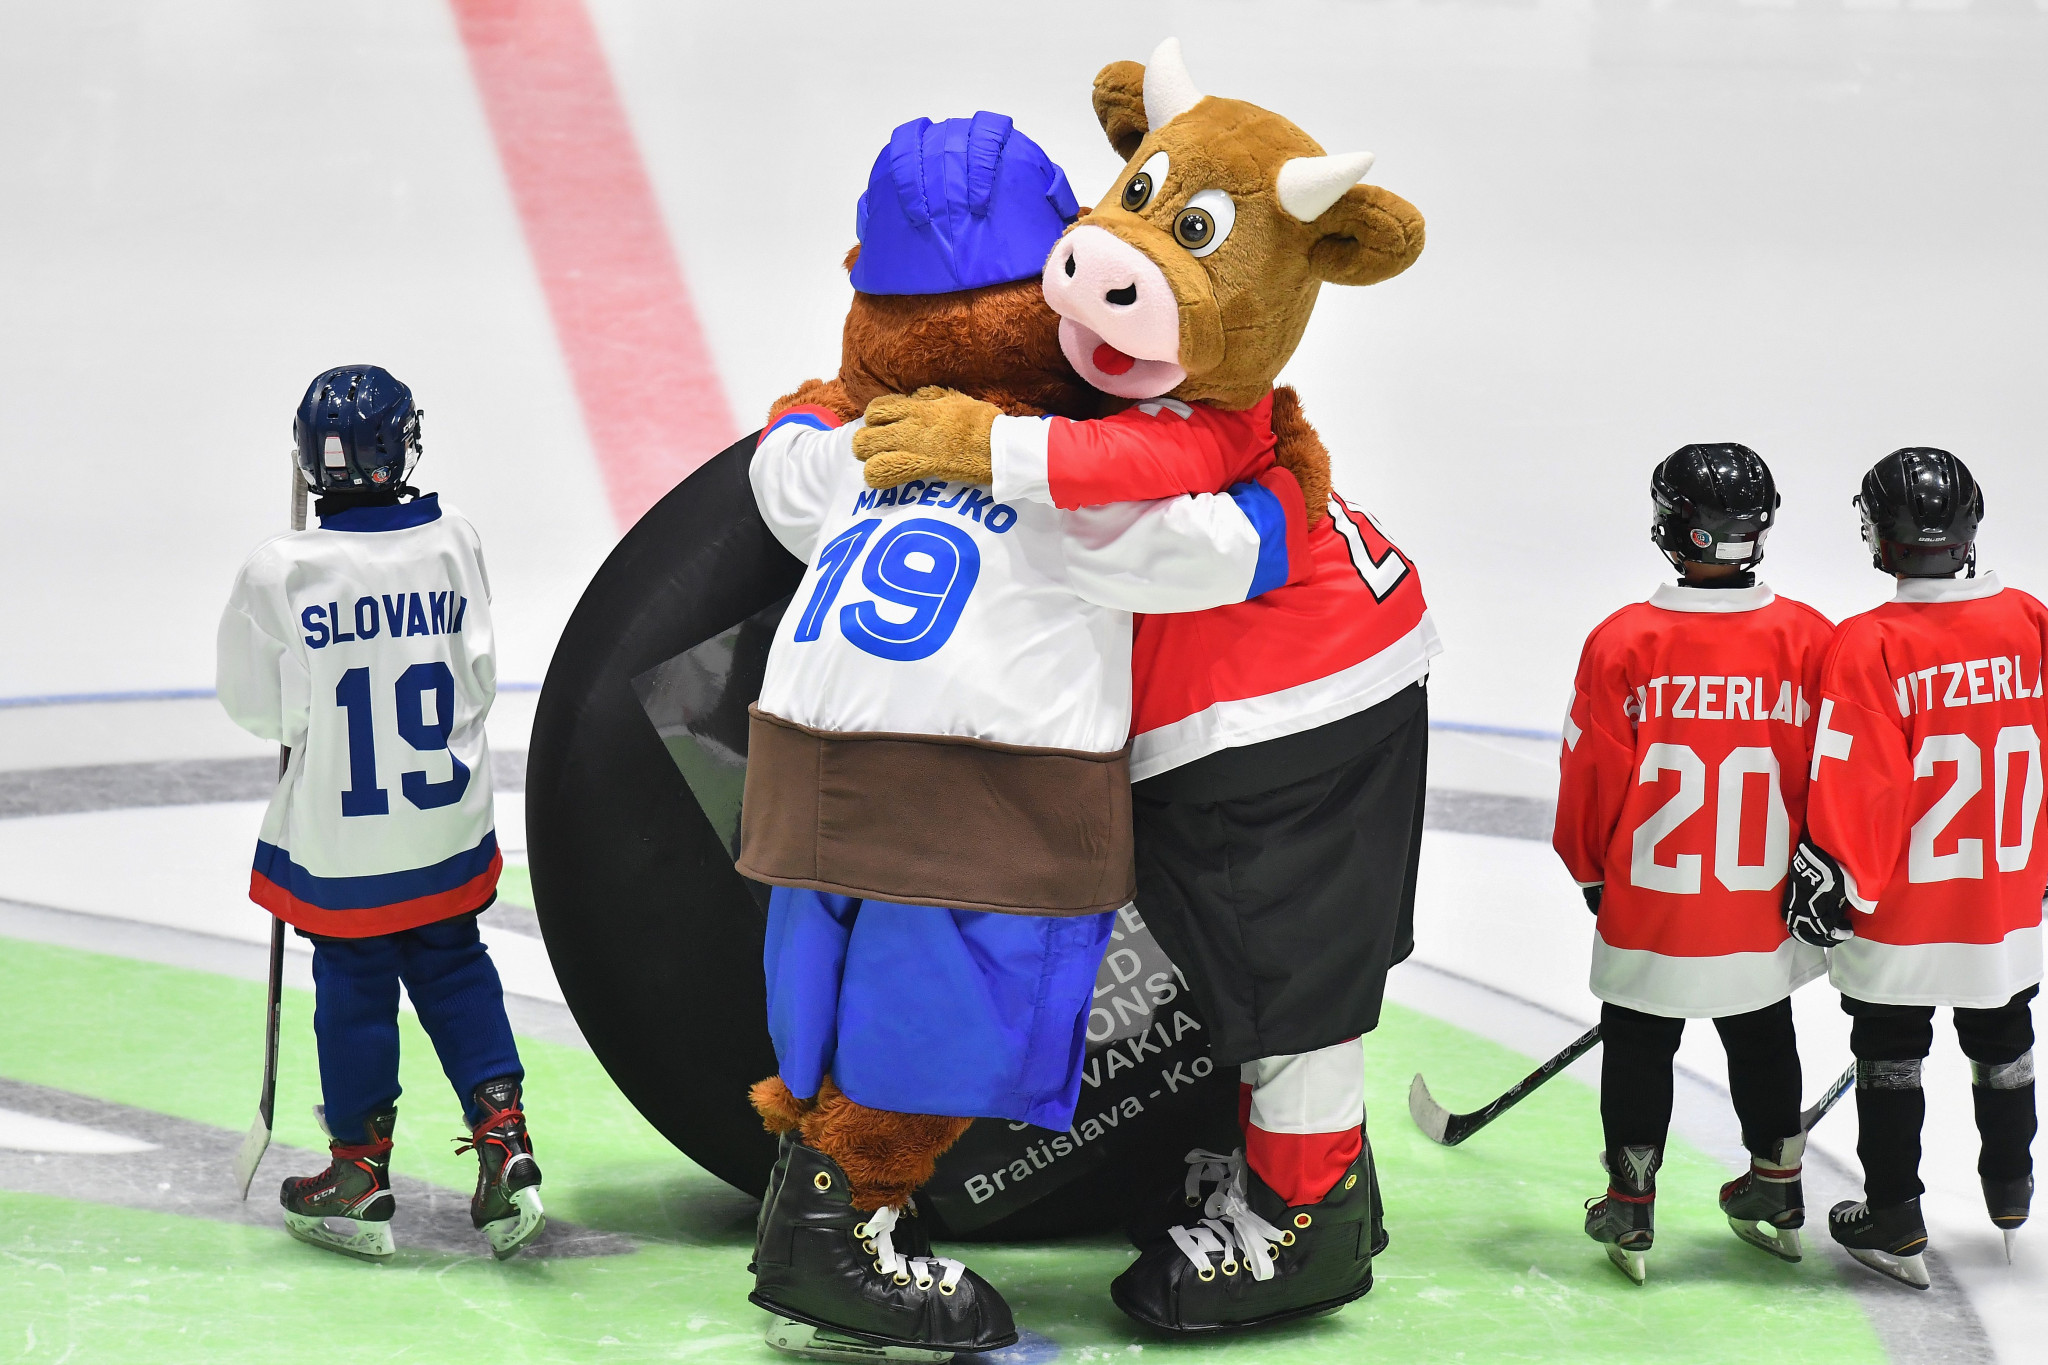 Swiss mascot Cooly to make return at 2020 IIHF World Championship